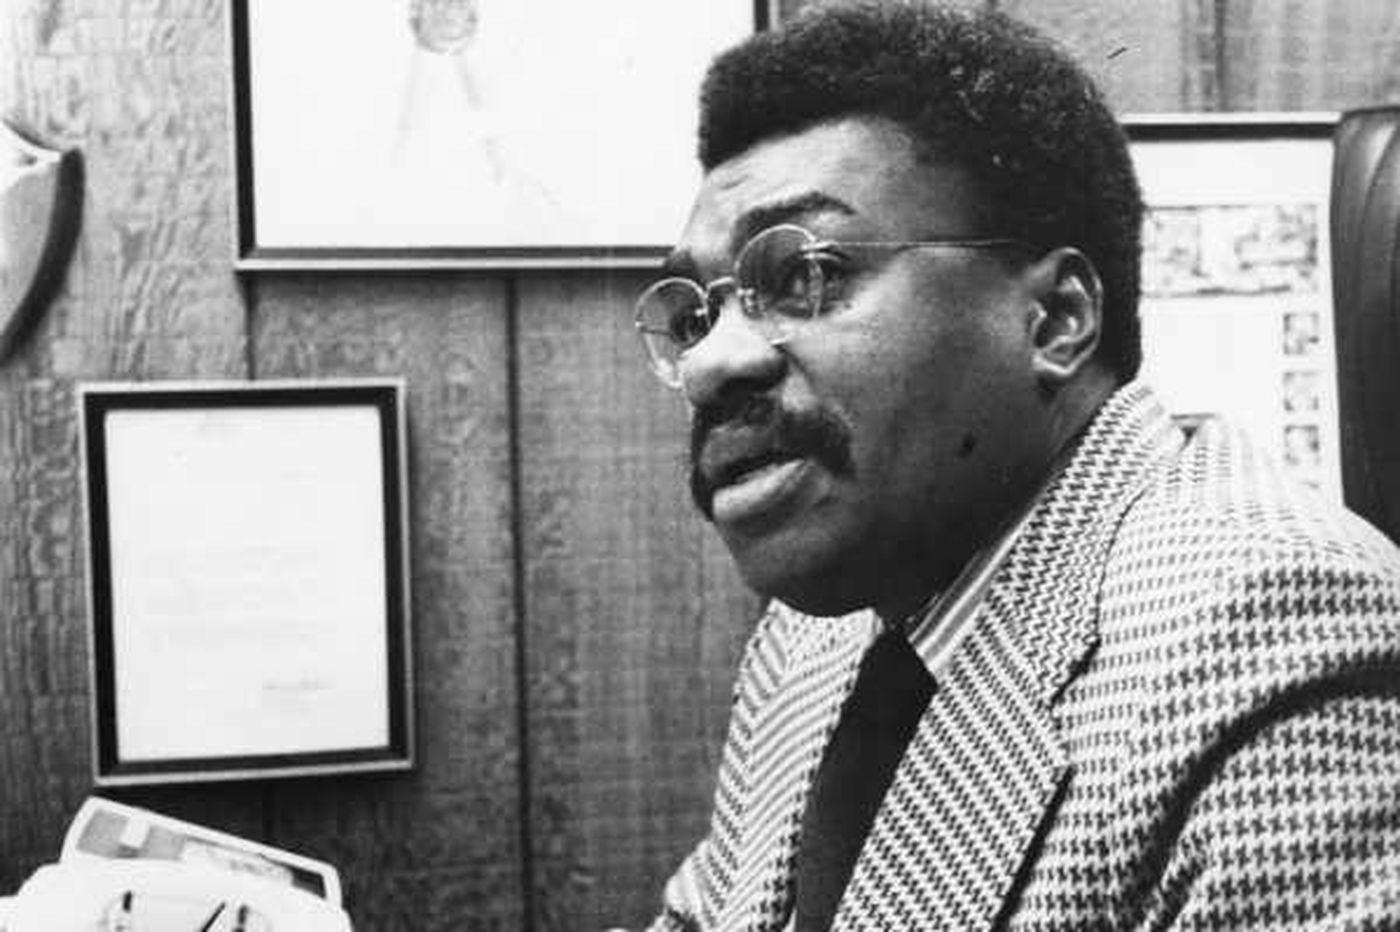 Augustus 'Gus' Baxter, 88, former Philadelphia School Board member